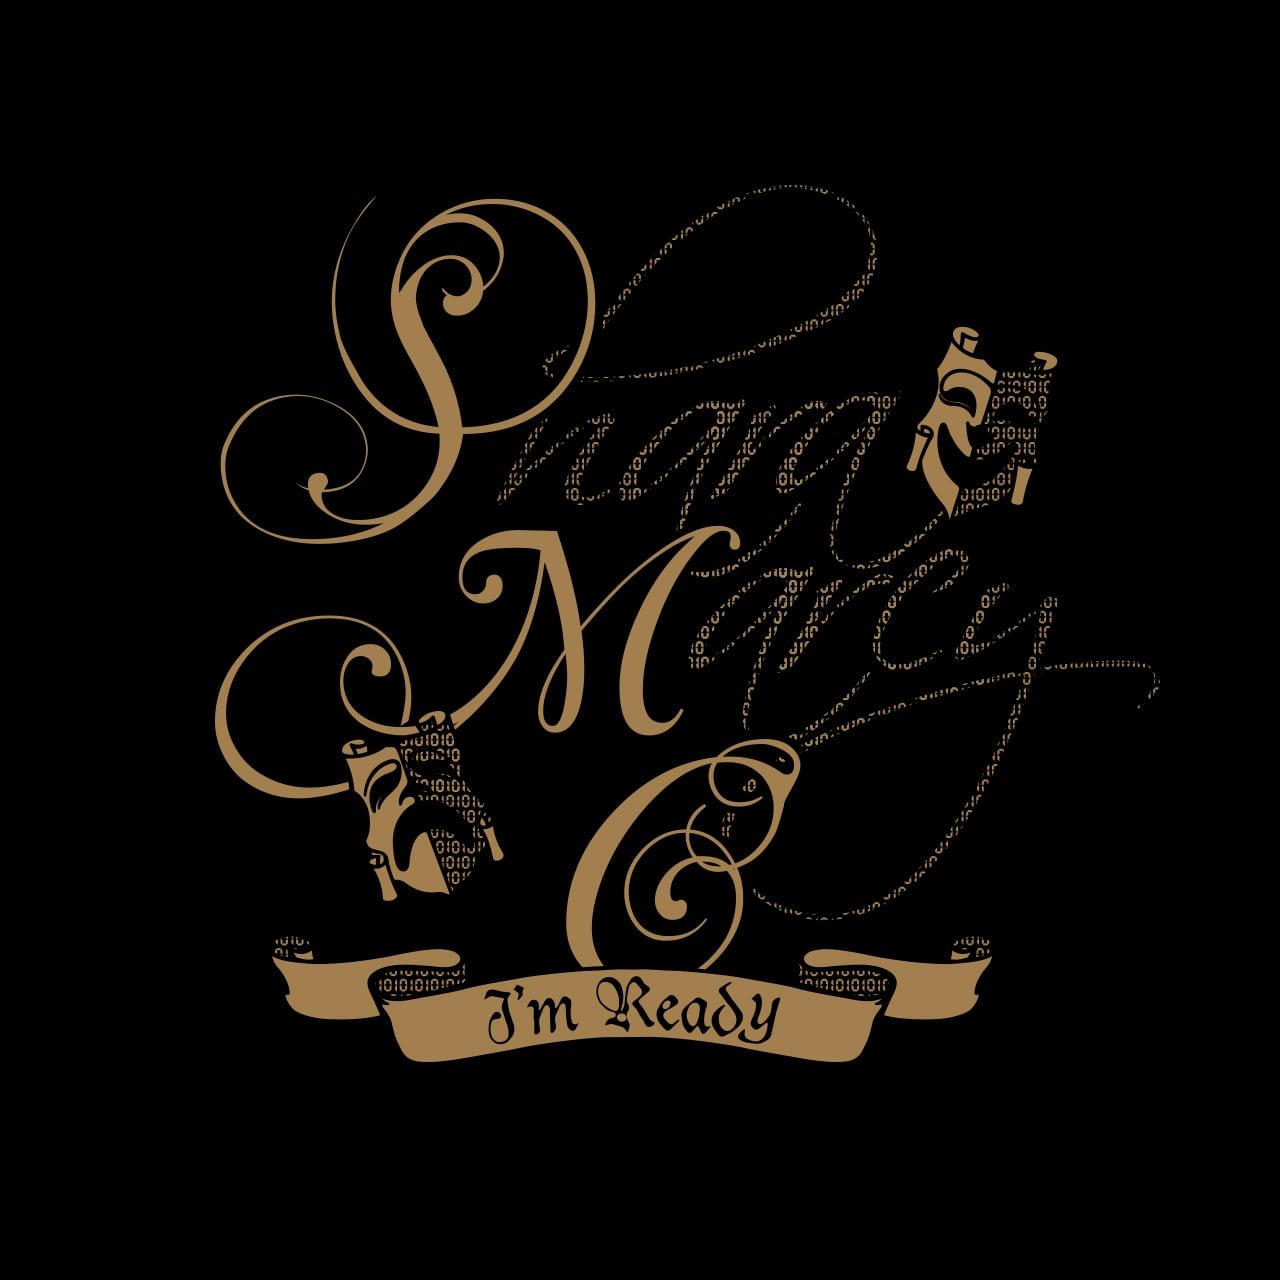 残少!! CD:『I'm Ready』SMC - 画像1